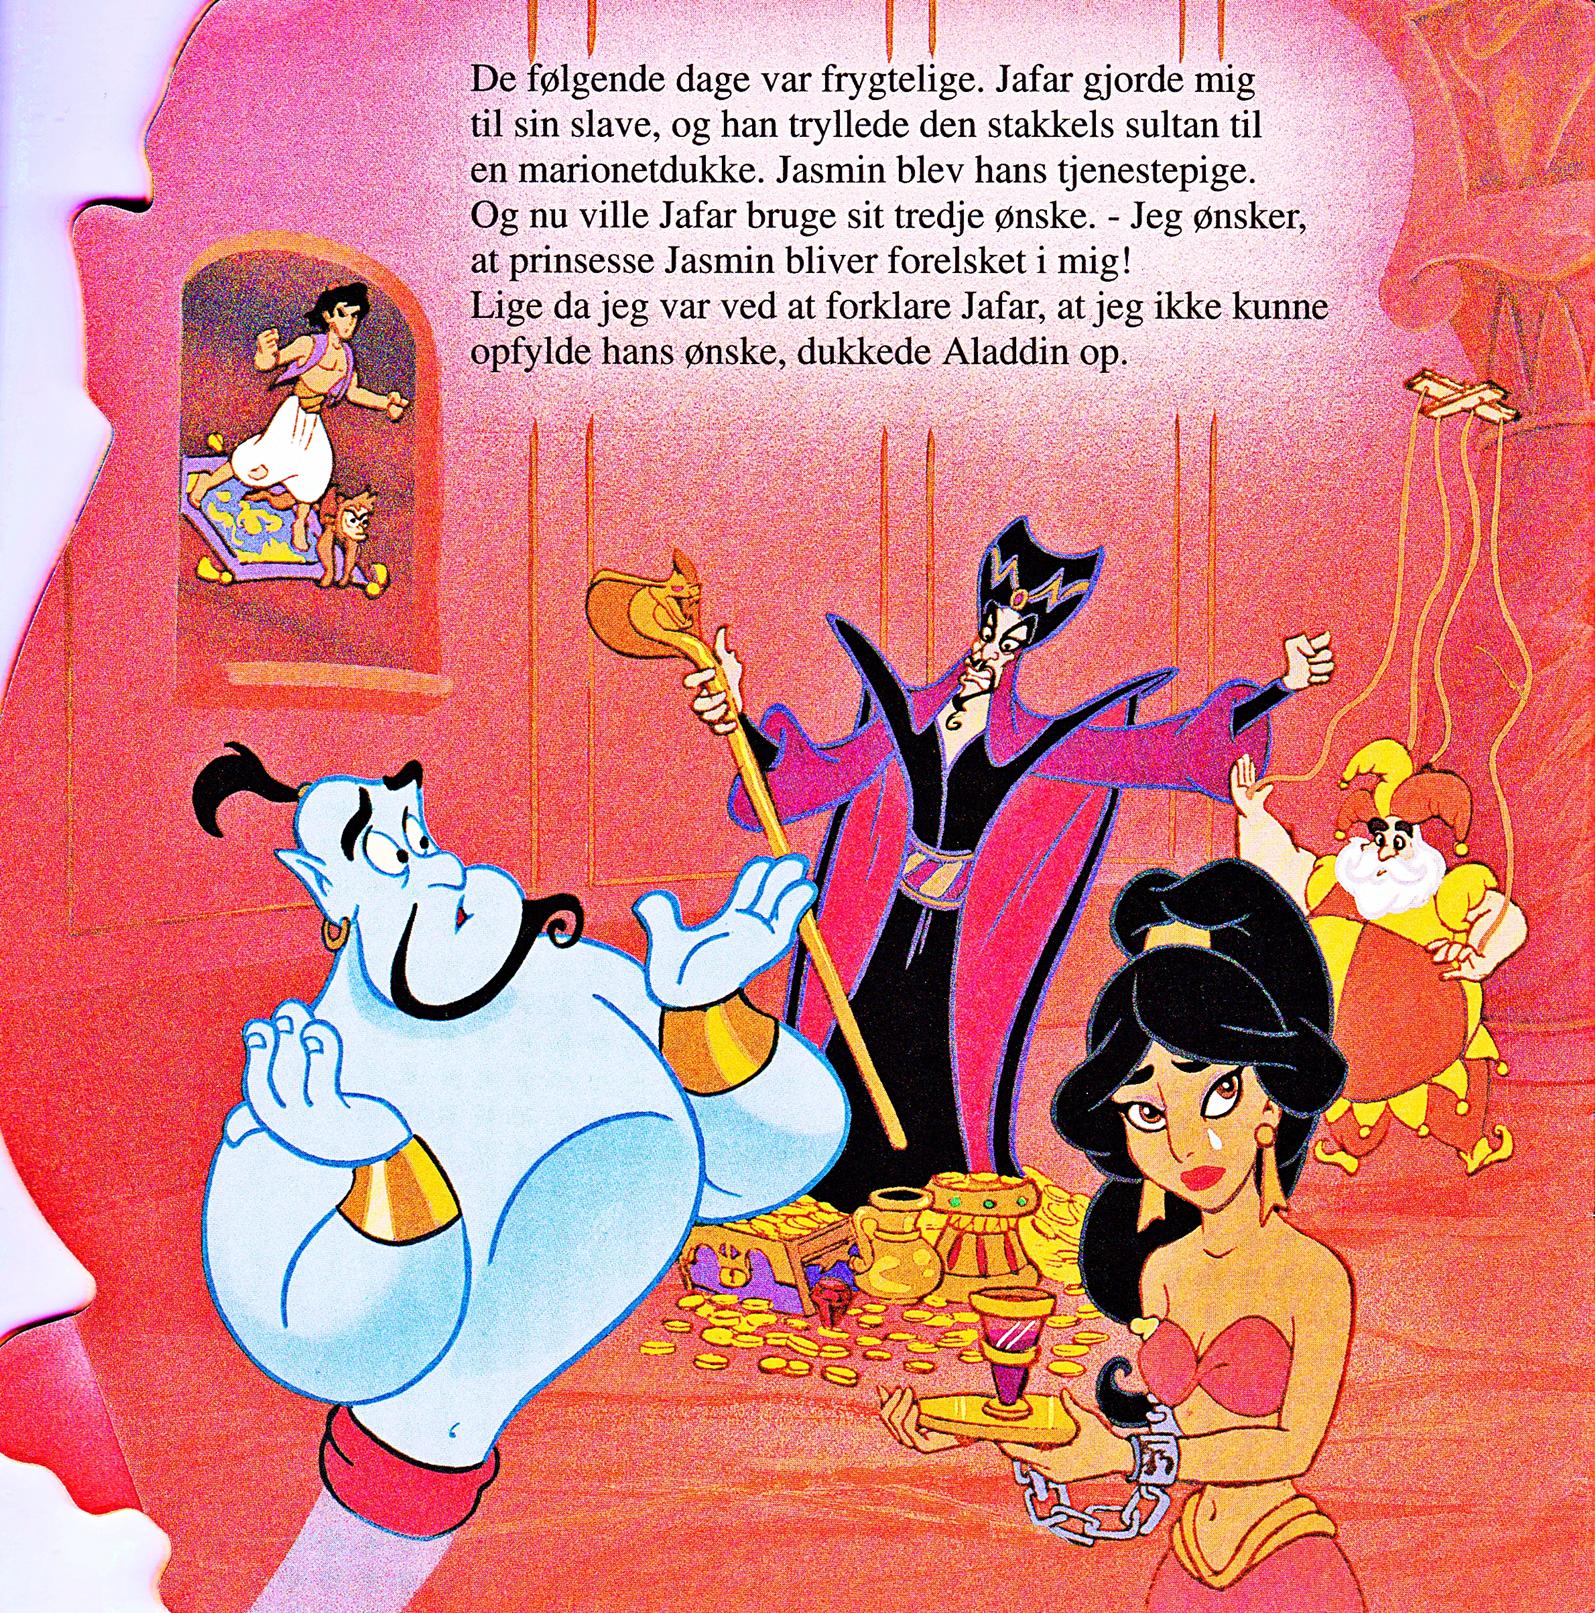 Walt Disney Book Scans – Aladdin: The Genie's Story (Danish Version)